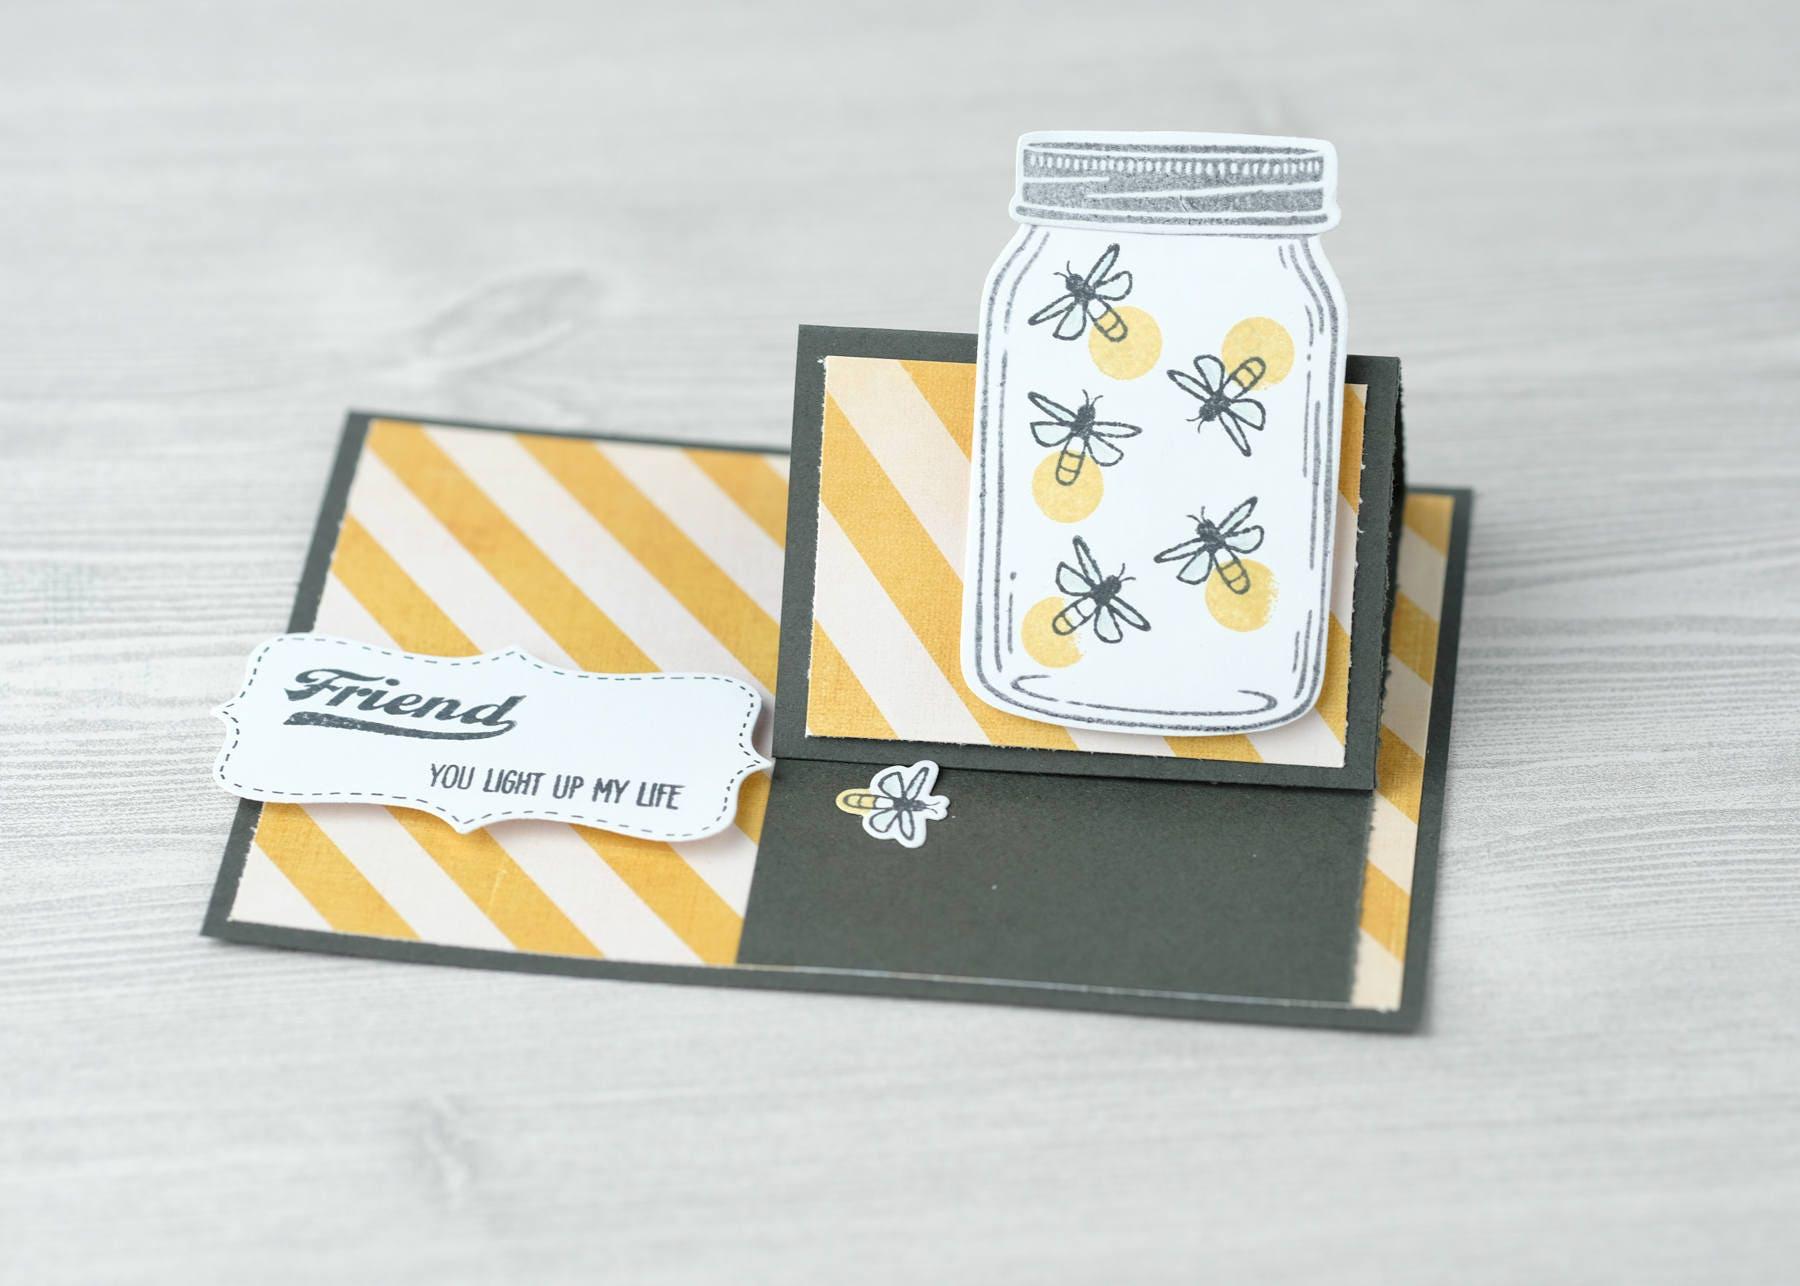 Firefly Friend Easel Pop Up Card Etsy